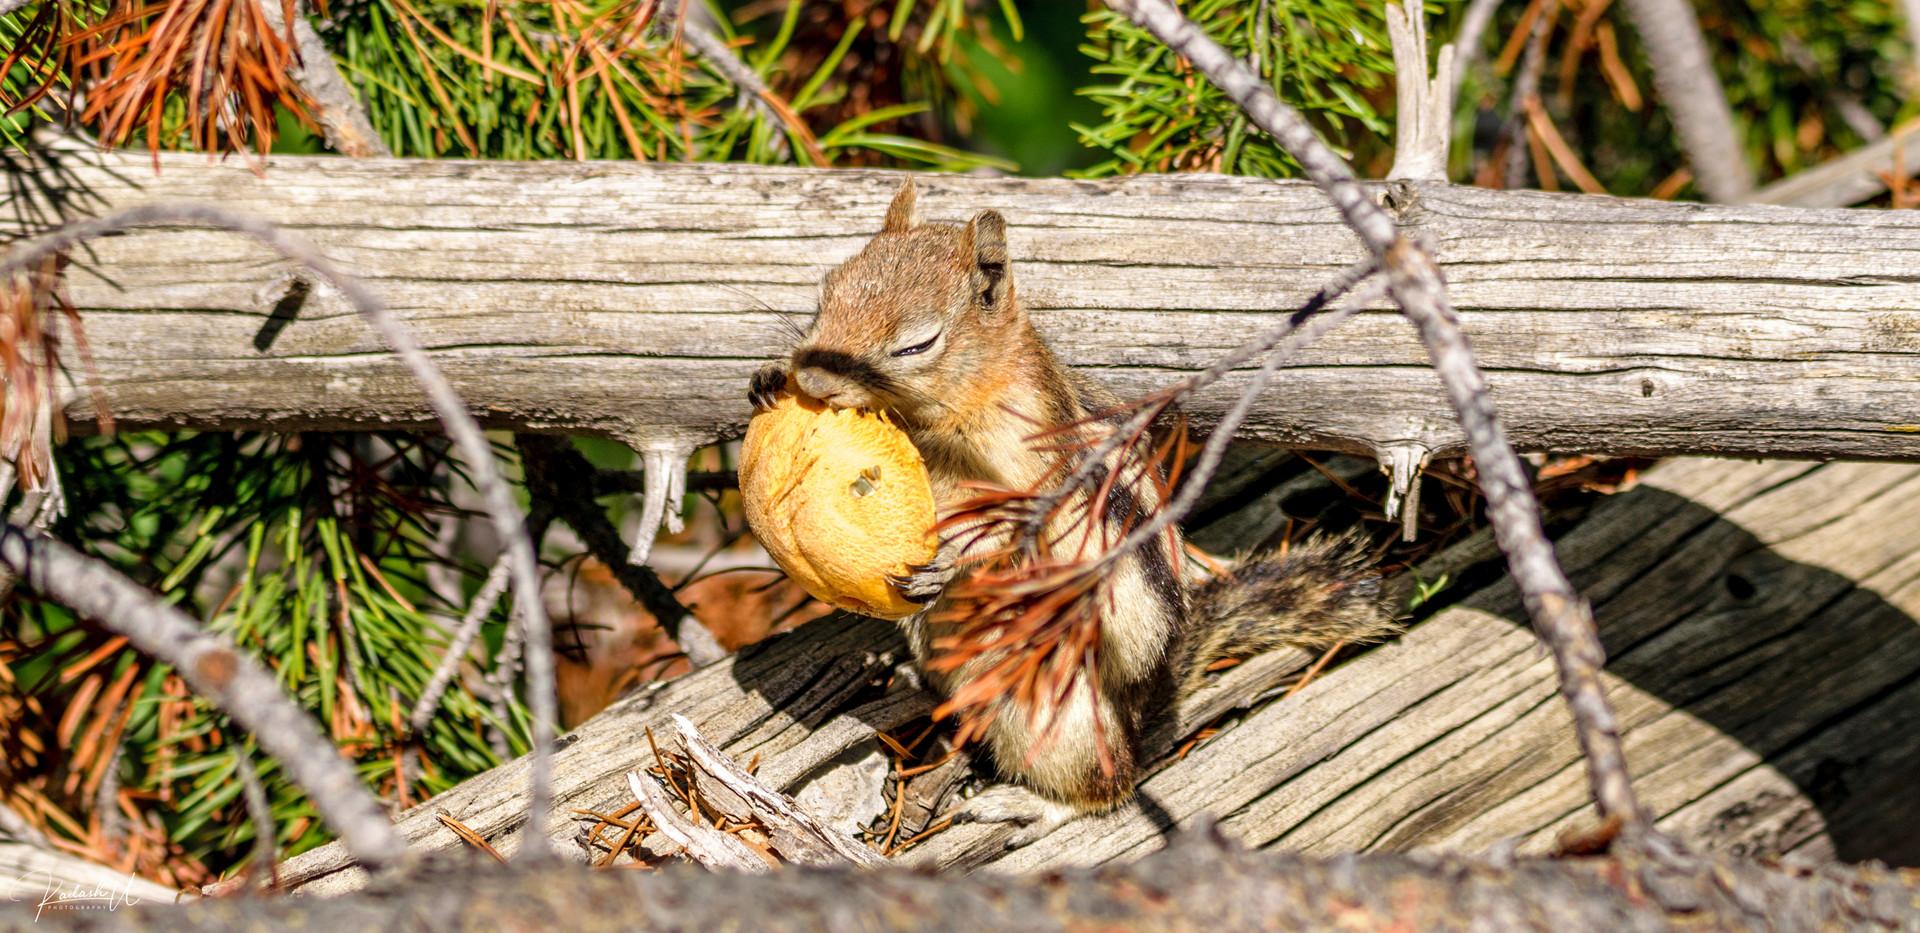 Chipmunk, Yellowstone National Park